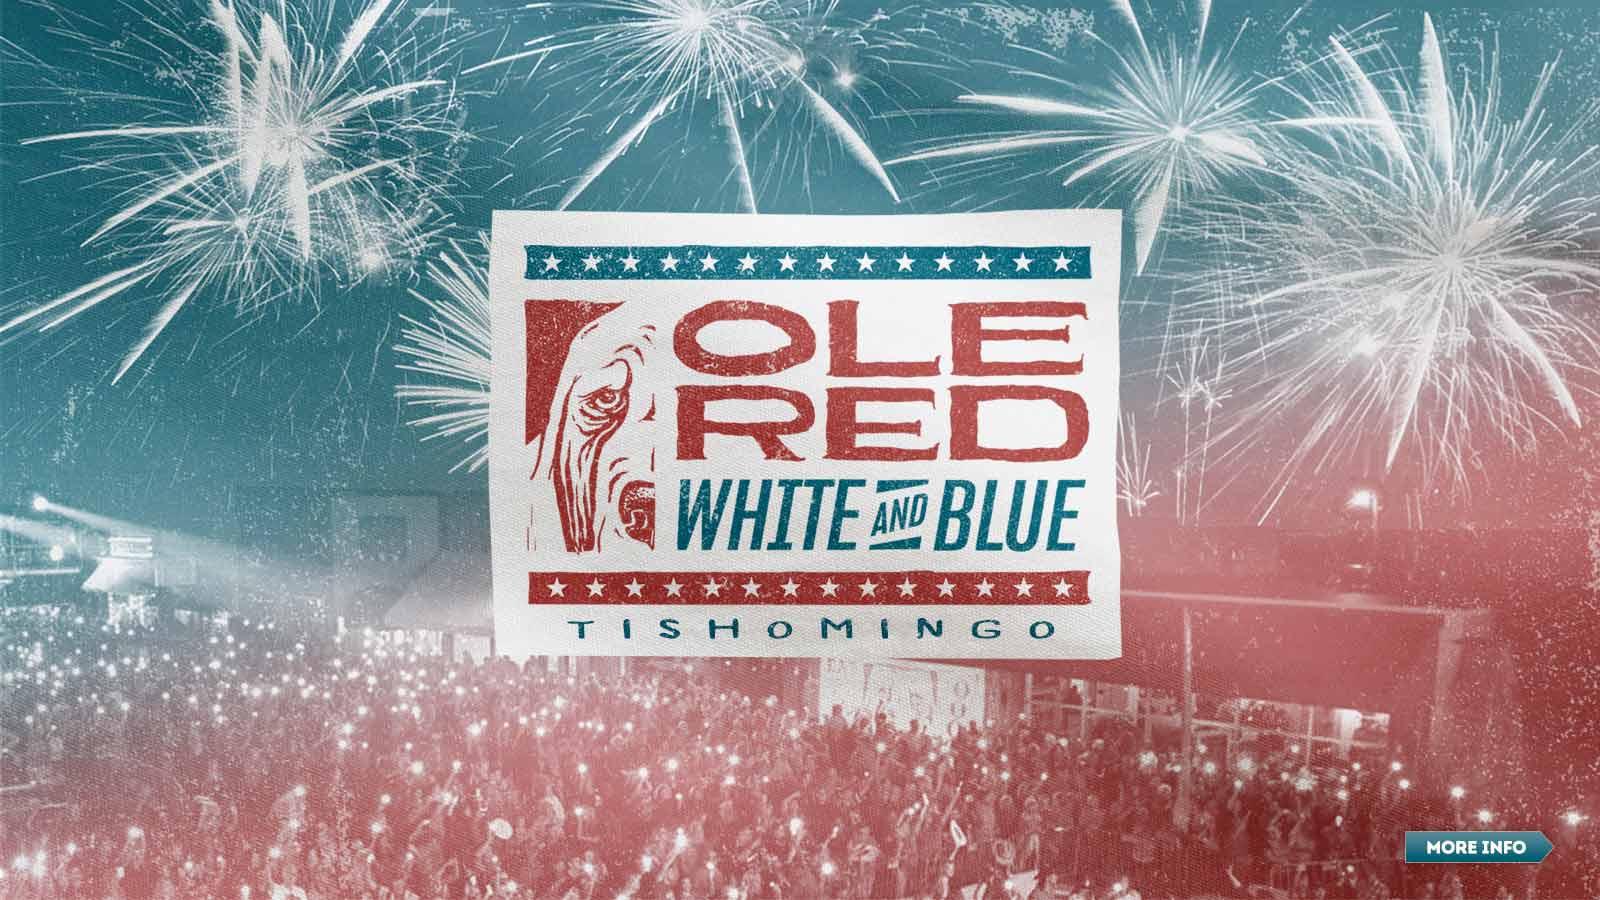 Ole Red White and Blue - Tishomingo